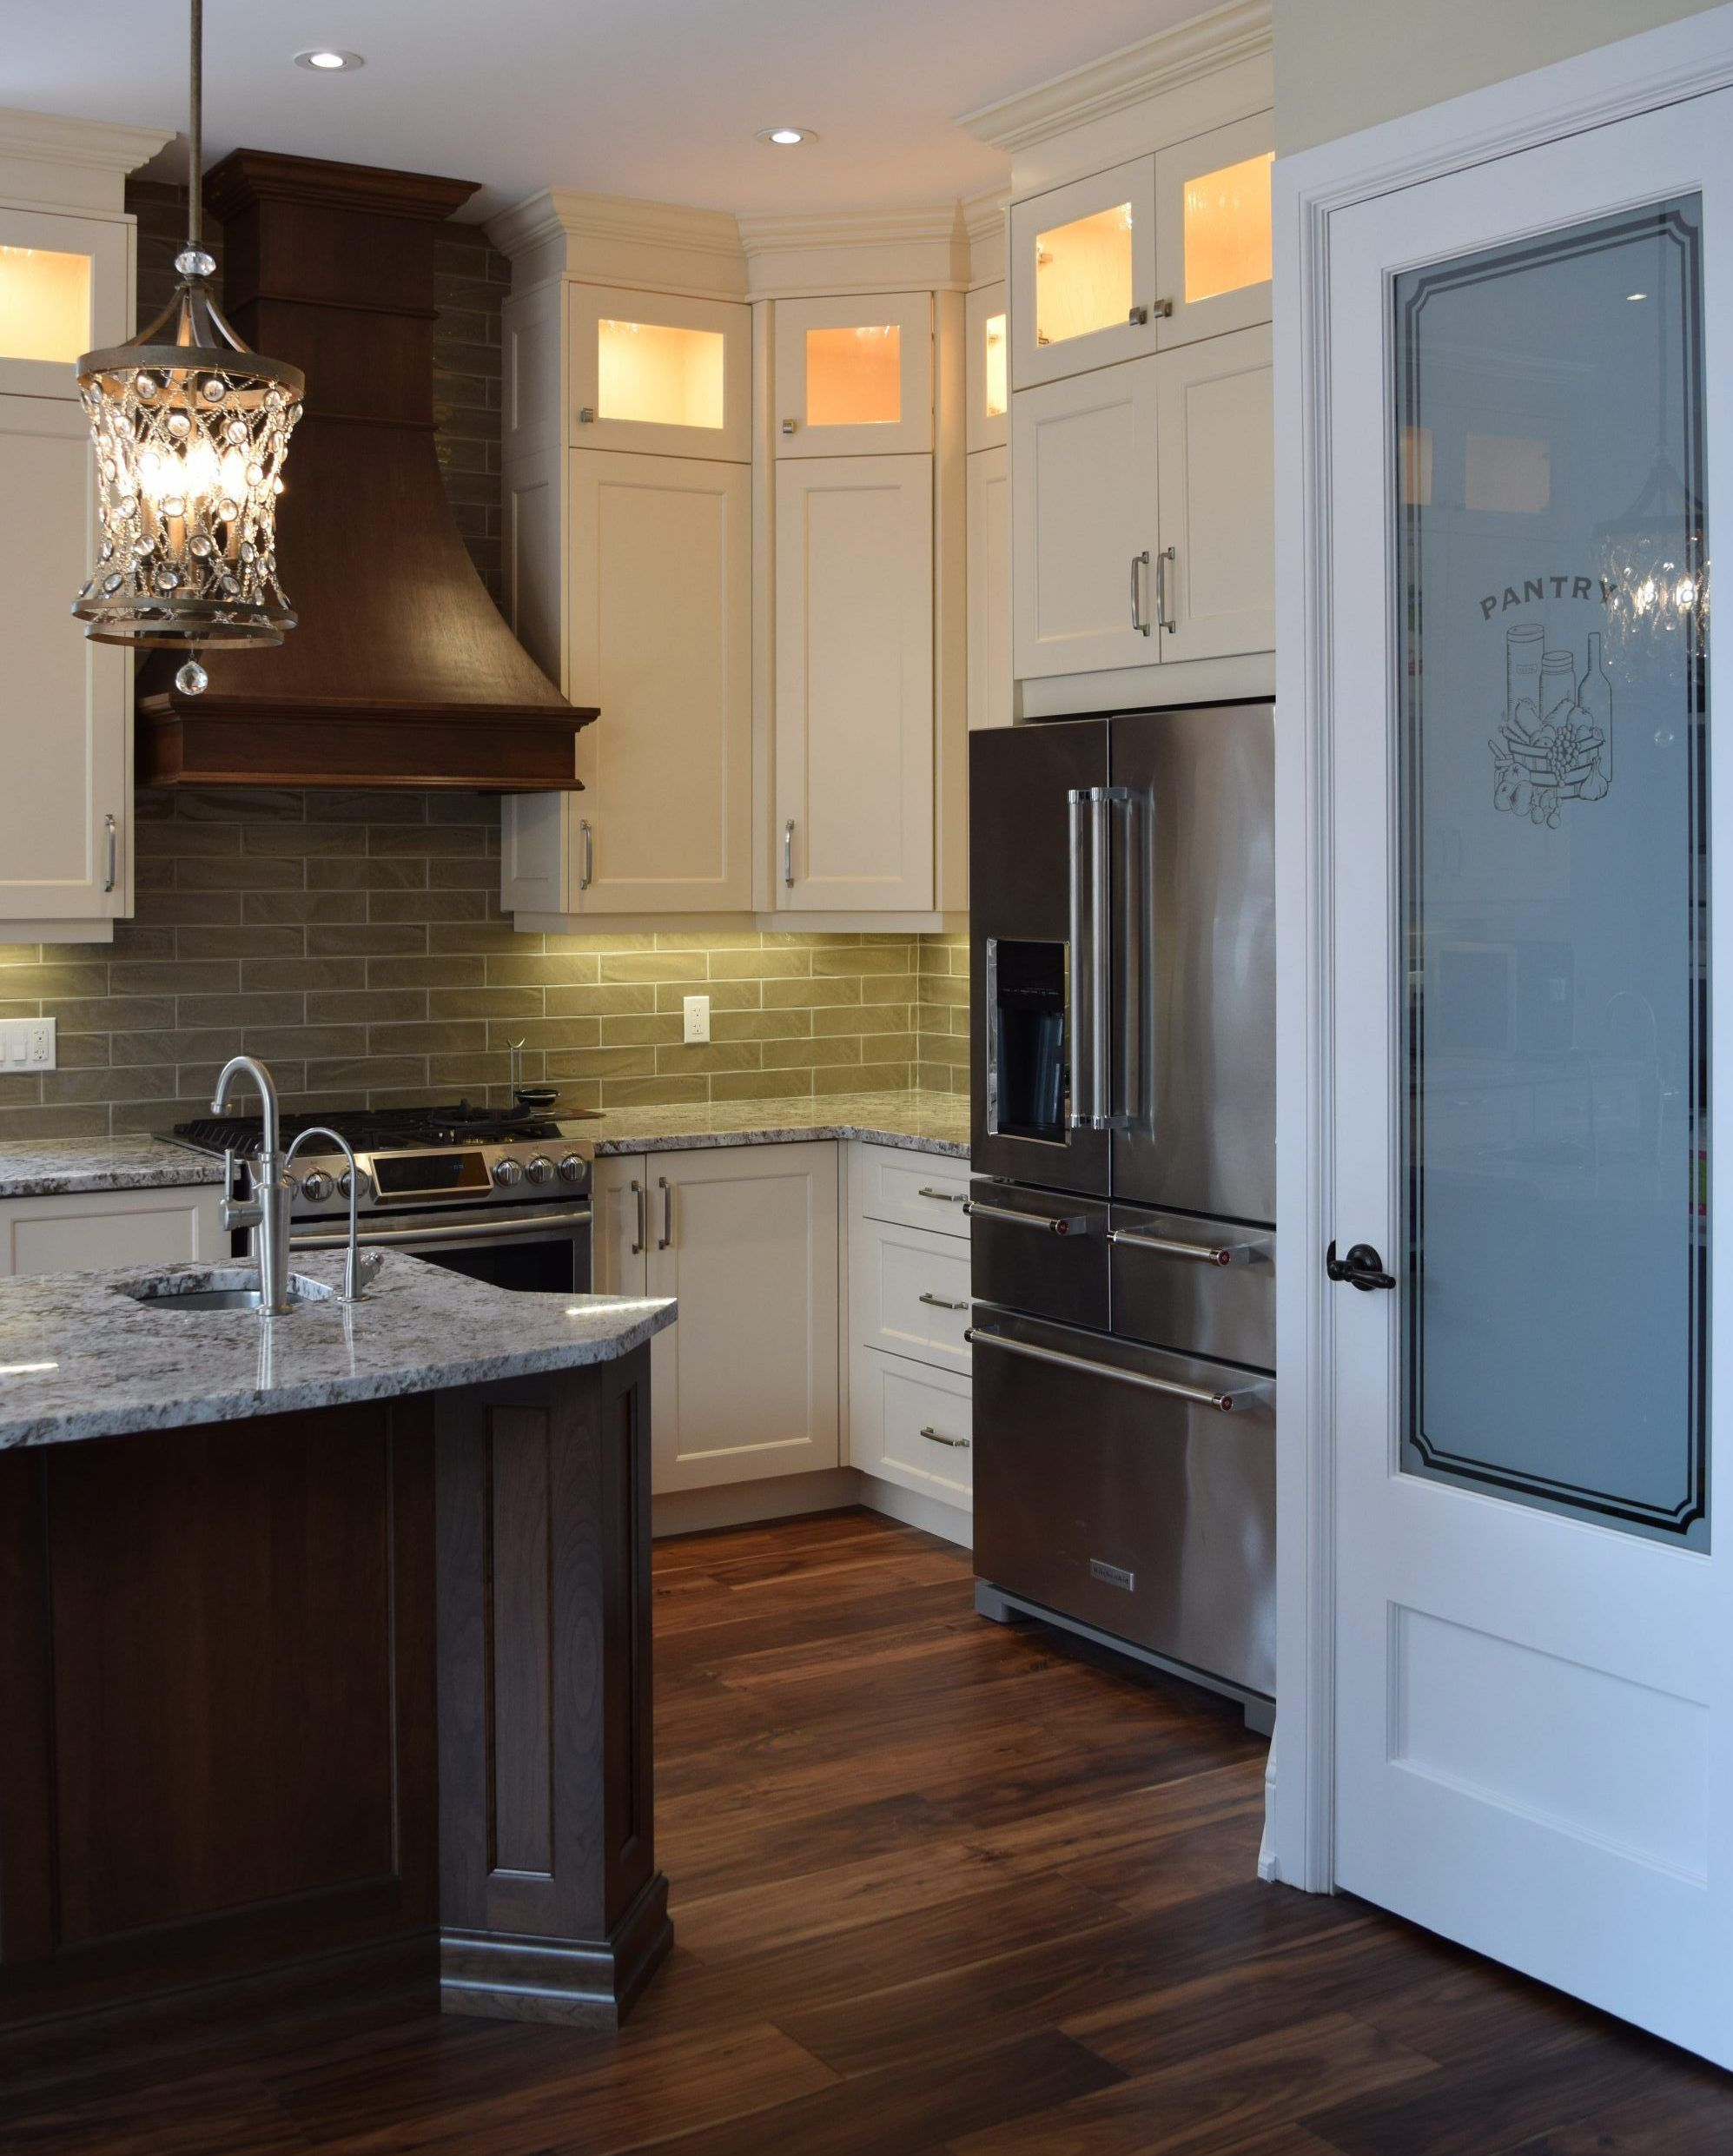 Azule Kitchens Making Your Kitchens More Attractive In 2020 Modern Kitchen Kitchen Cabinetry Kitchen